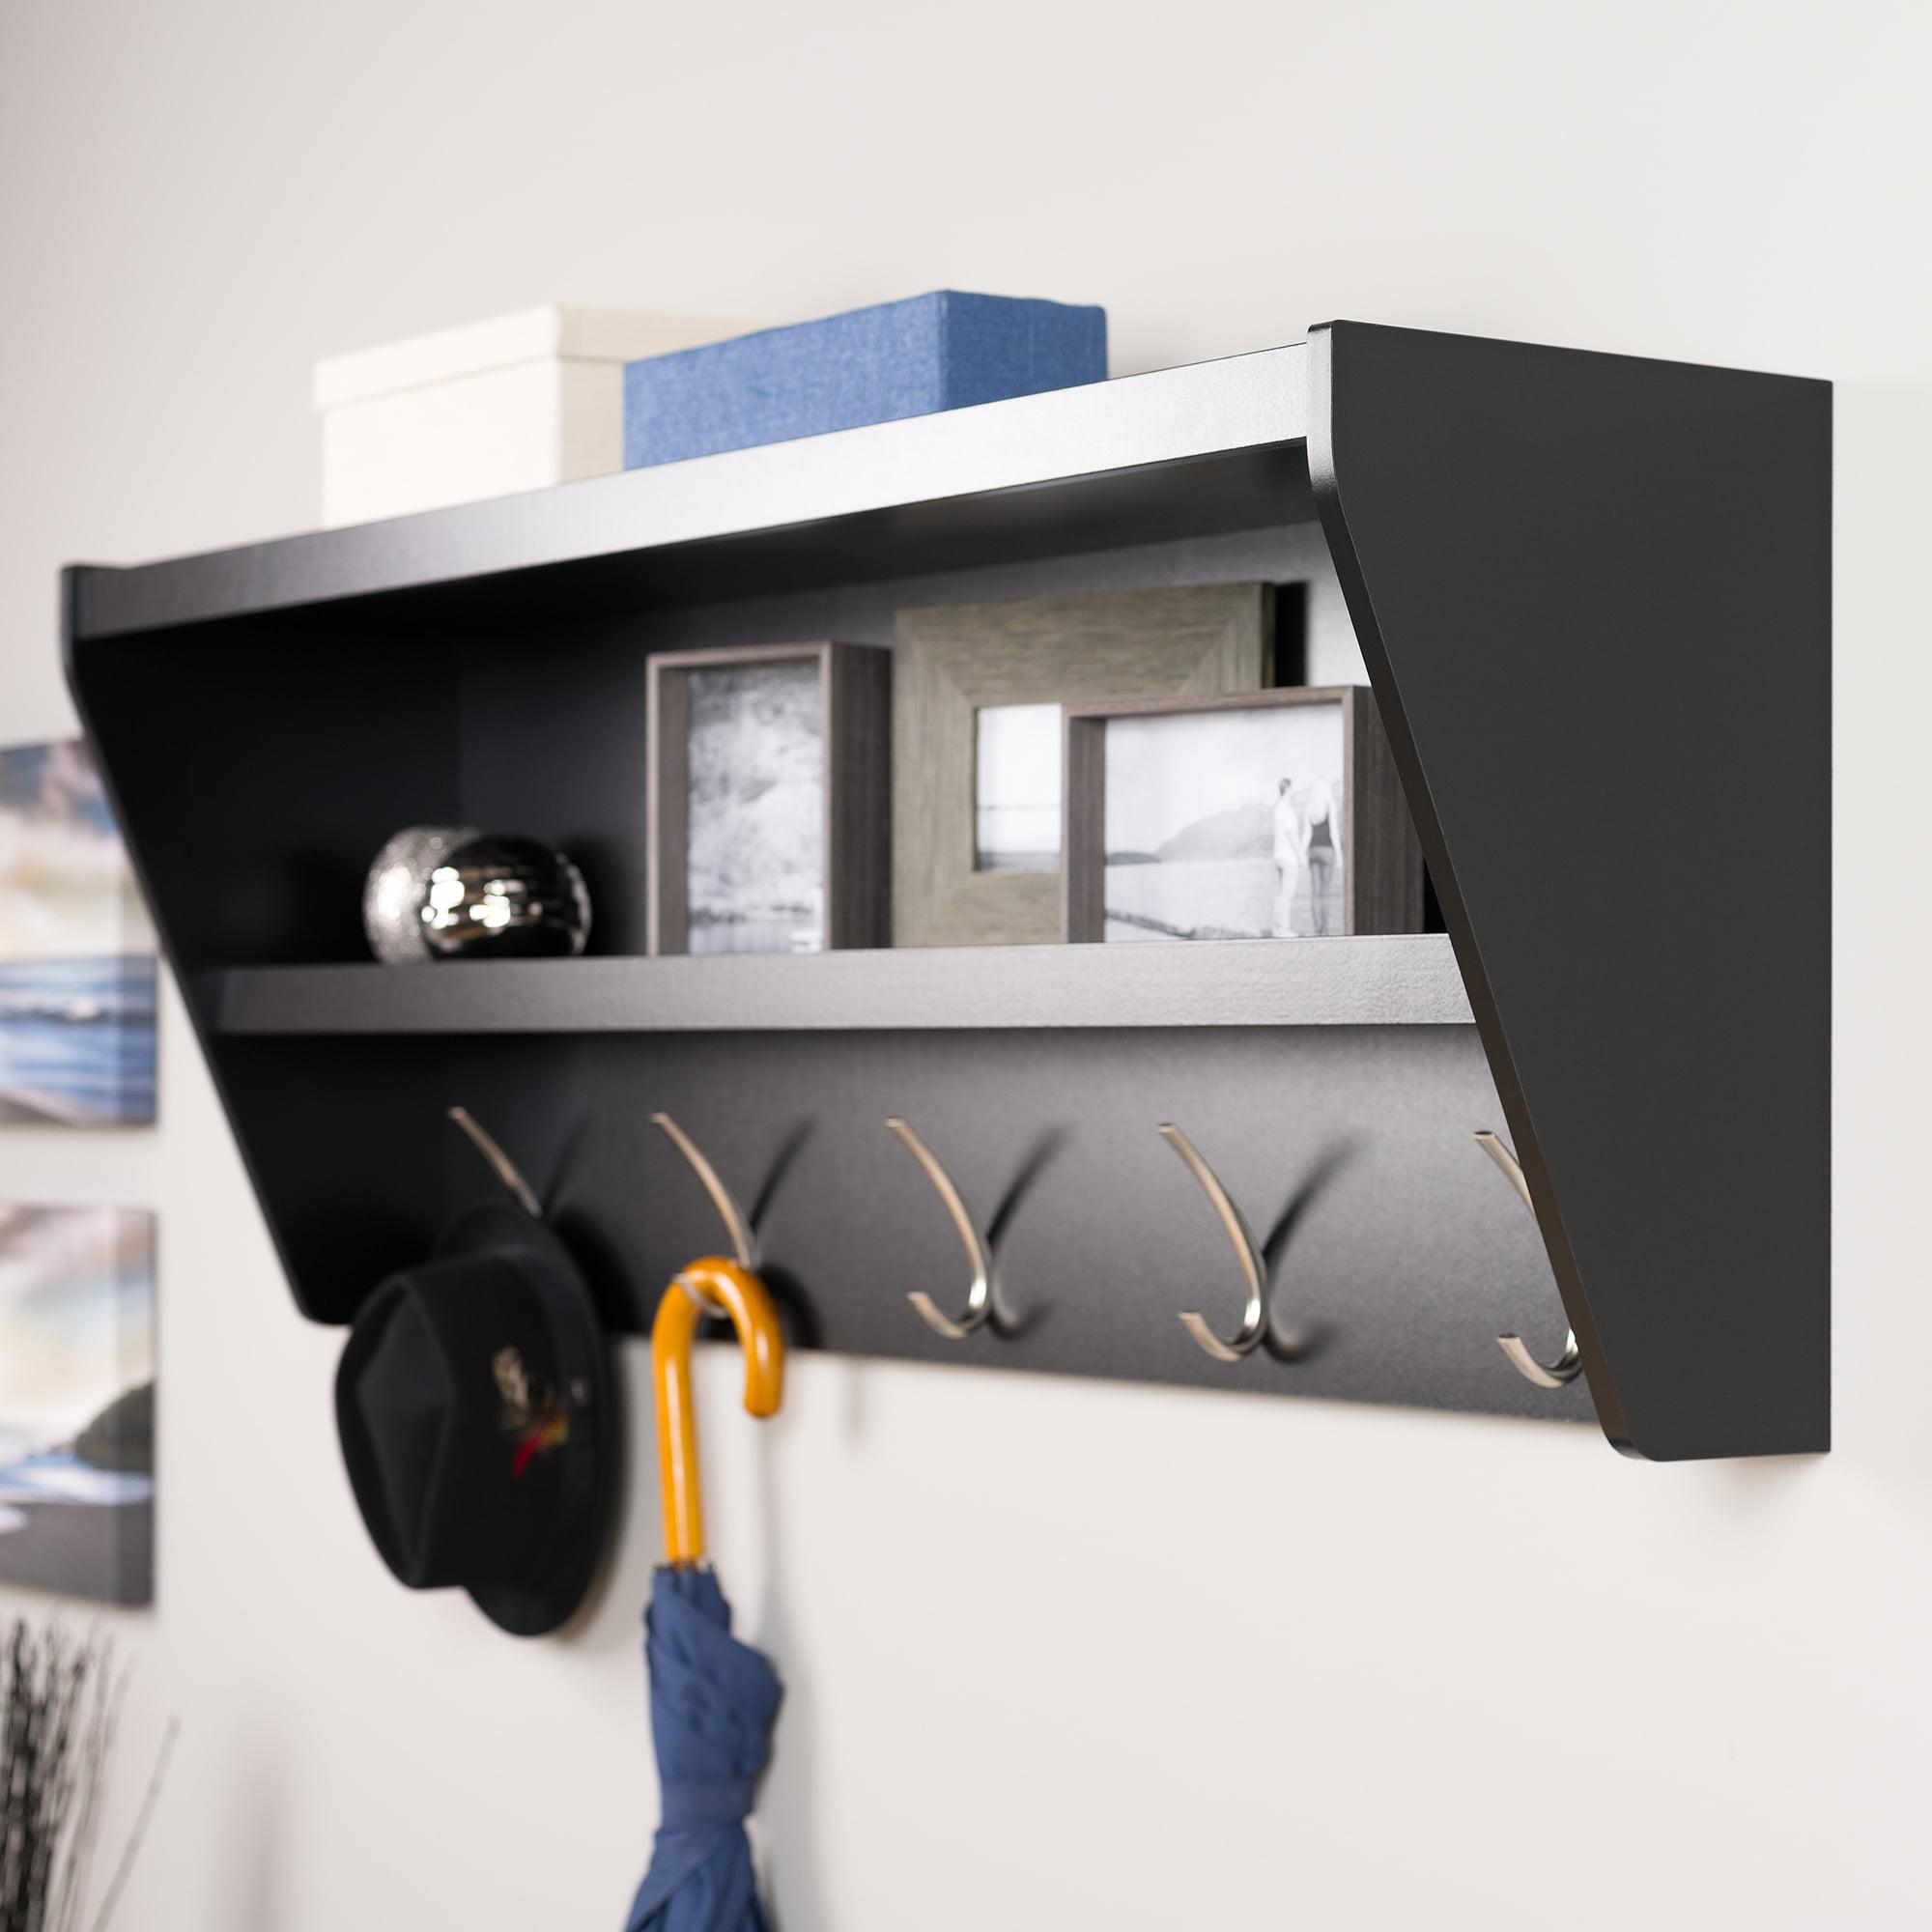 Prepac Floating Entryway Shelf and Coat Rack - Walmart.com